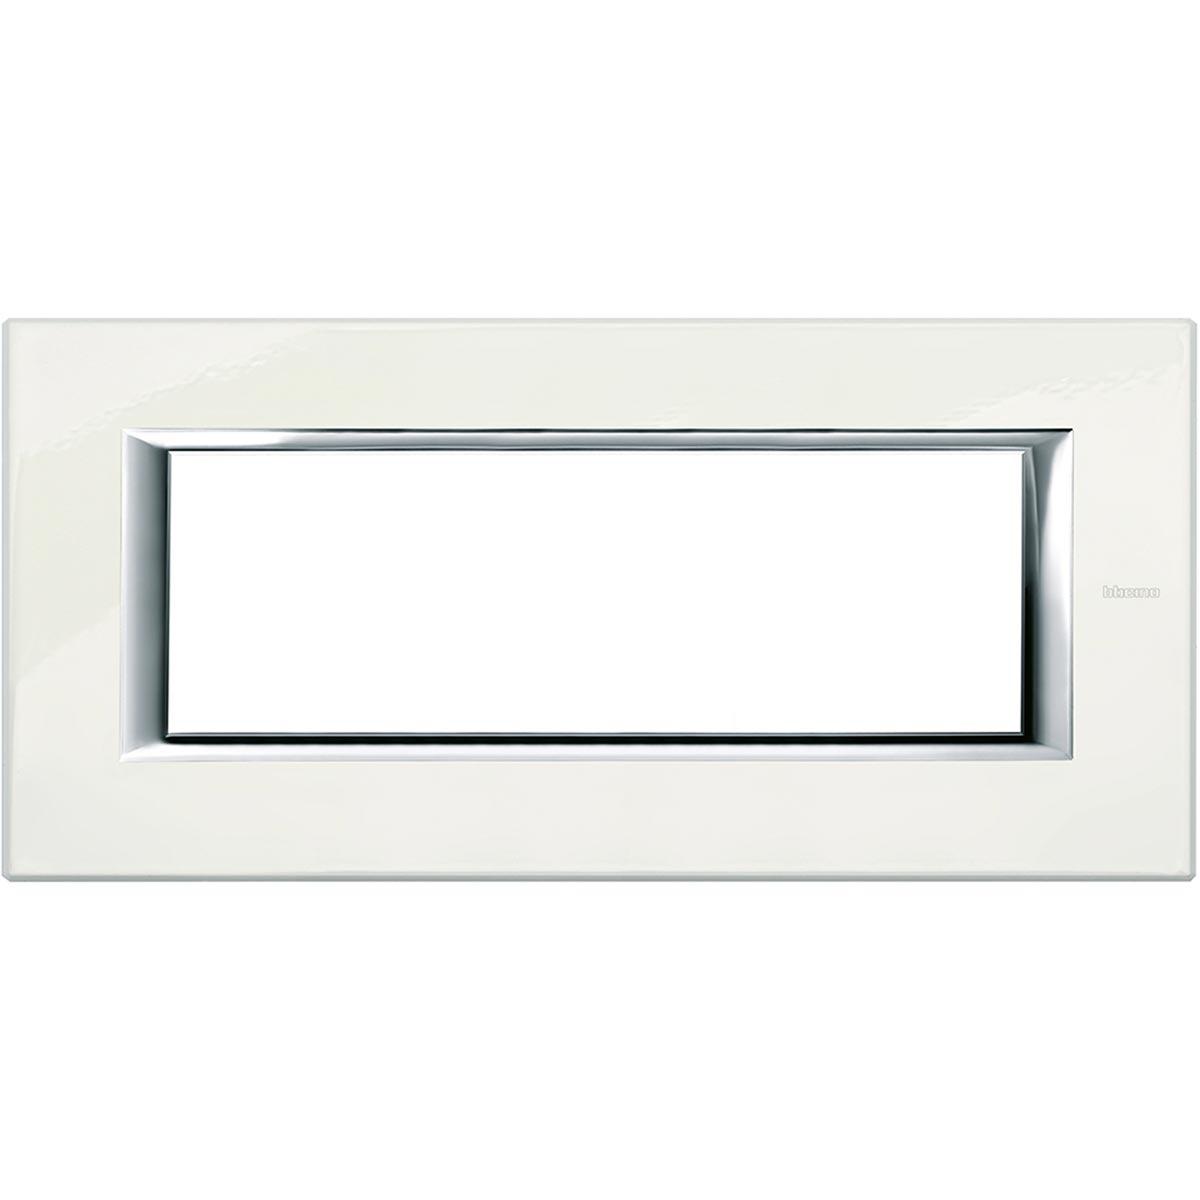 Placca 6 Posti Bticino Axolute Bianco Limoges HA4806BG